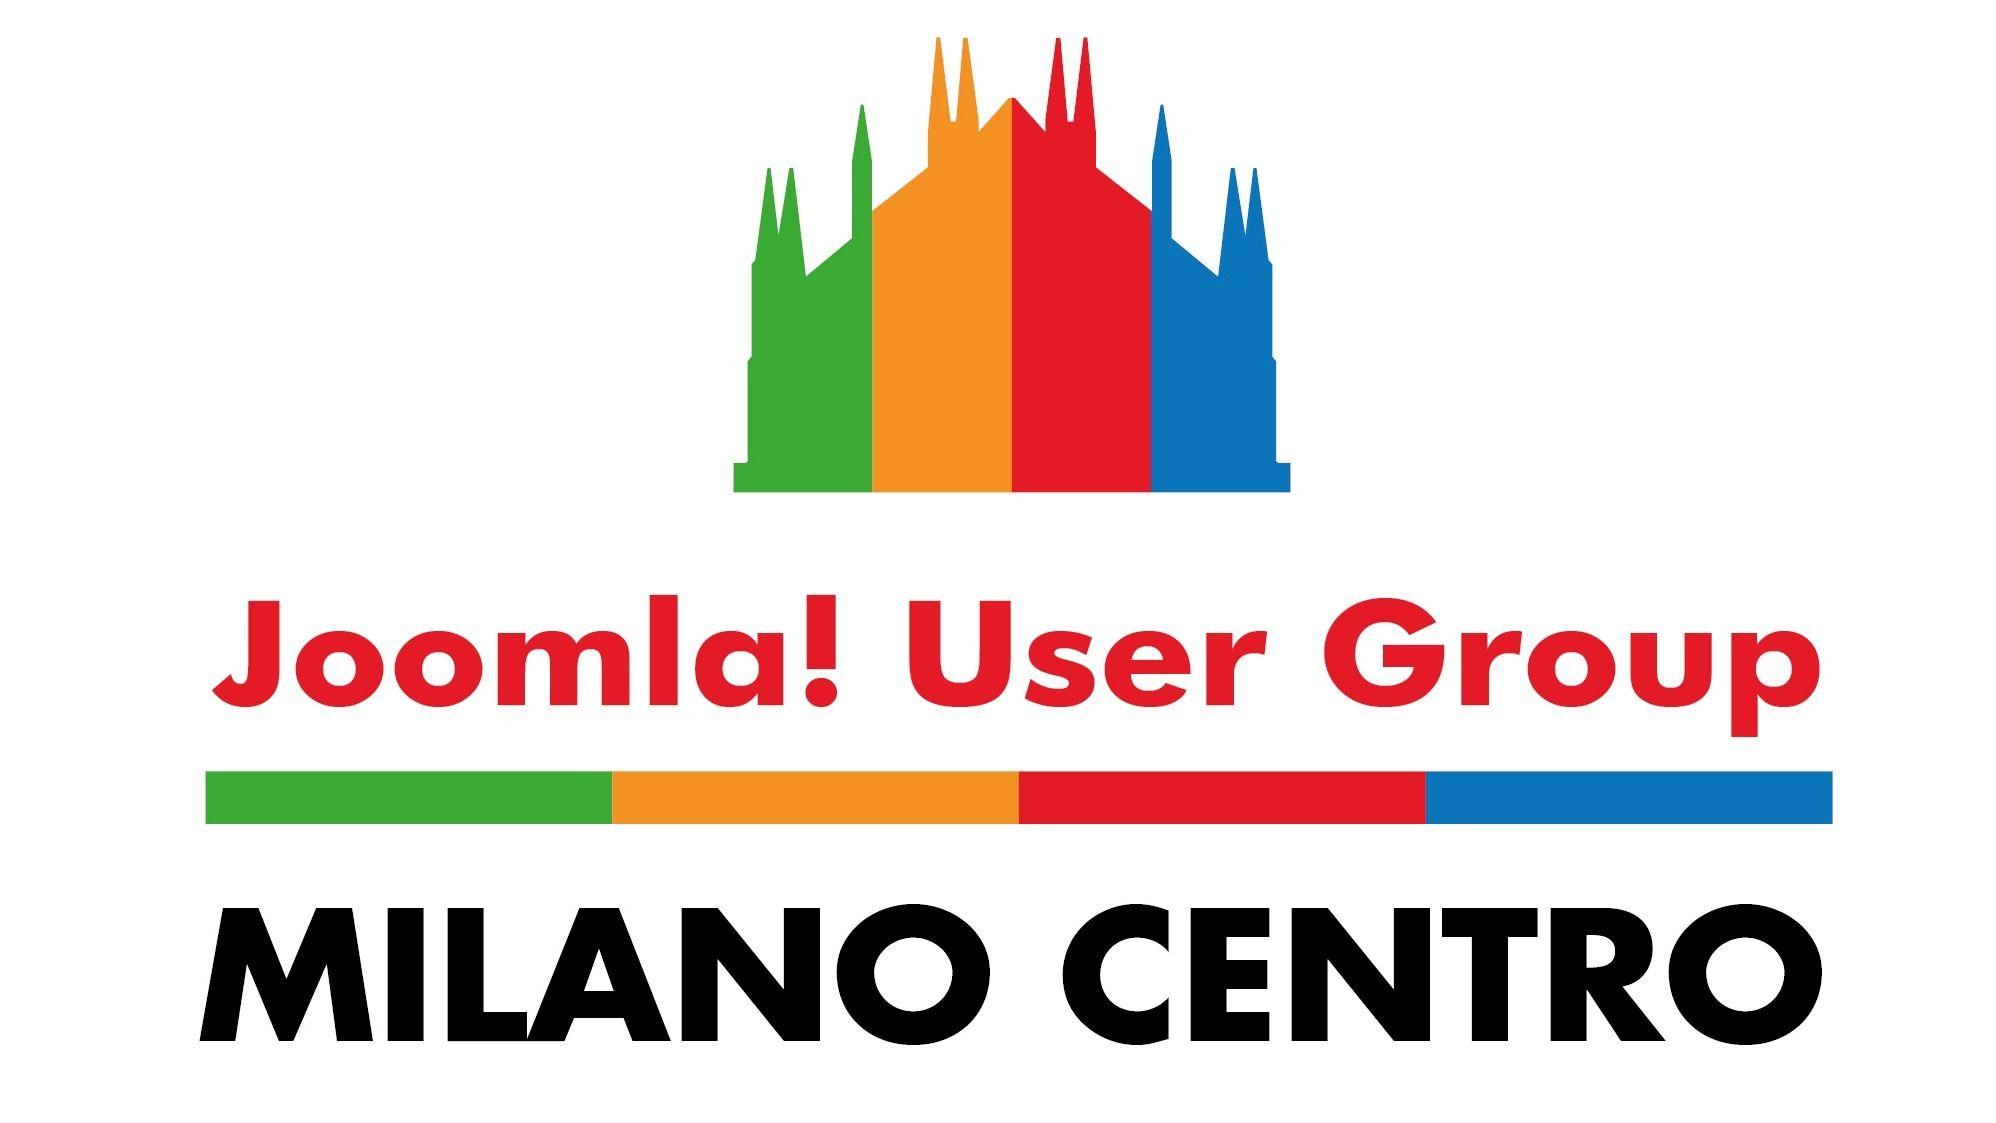 Joomla! User Group Milano Centro